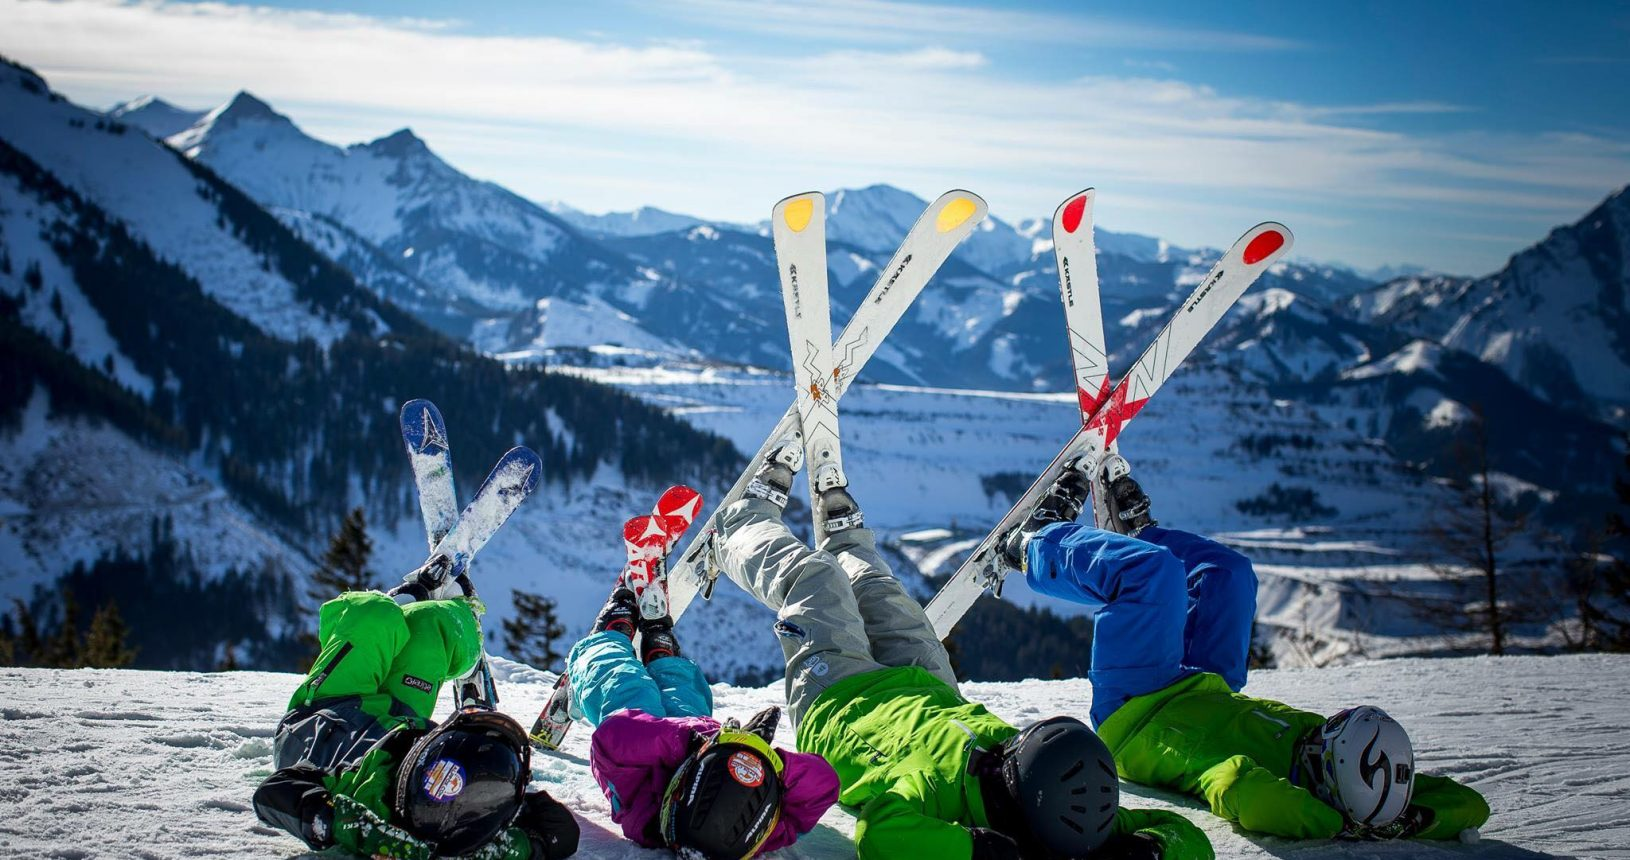 Alpesi-szállás-kalandok-prabichl-sieles-snowboard-www.alpesikaland.hu-9